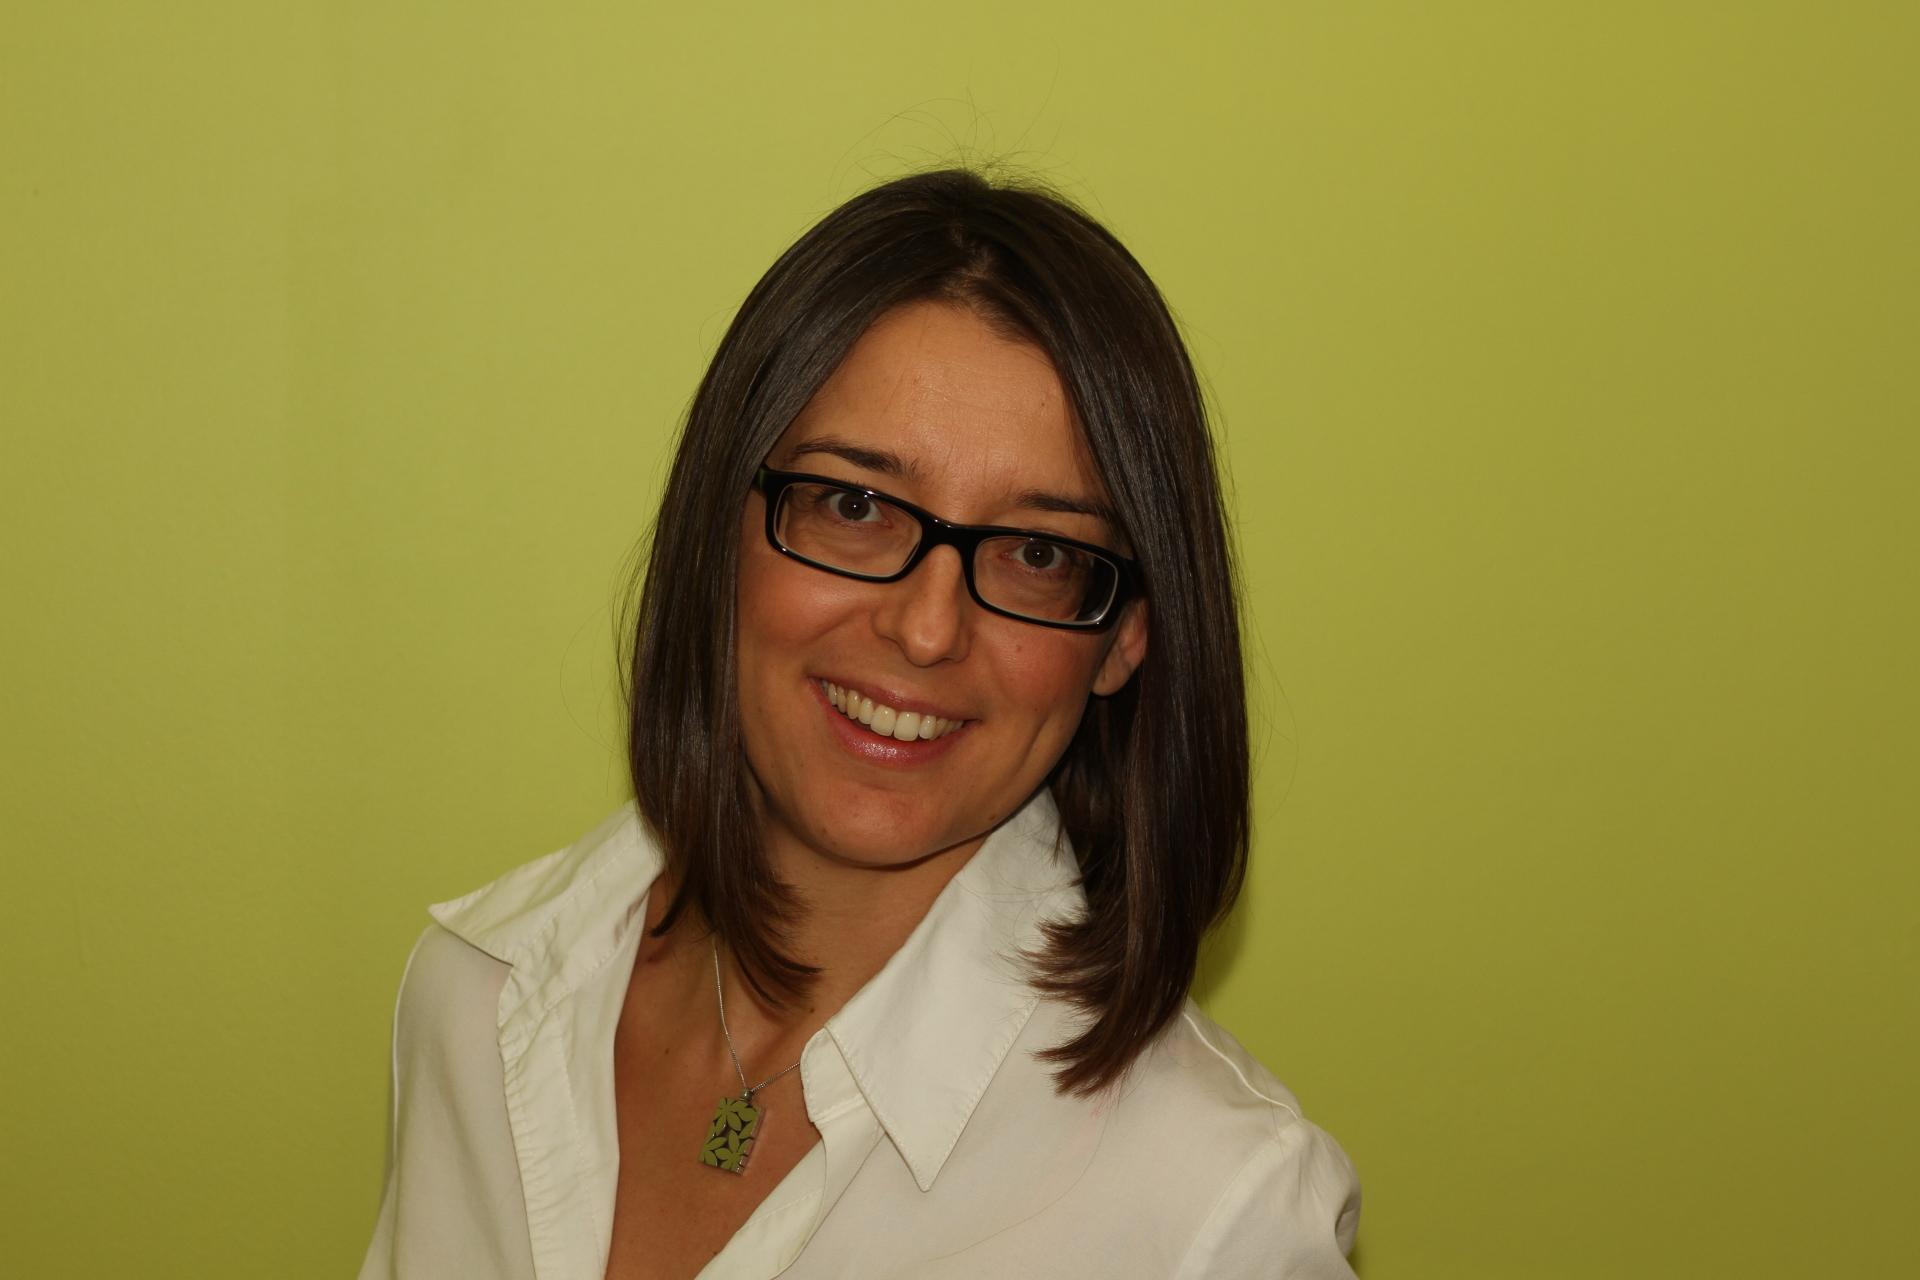 Meet The Team:  Celine Royet, Course Director, Actuator Series